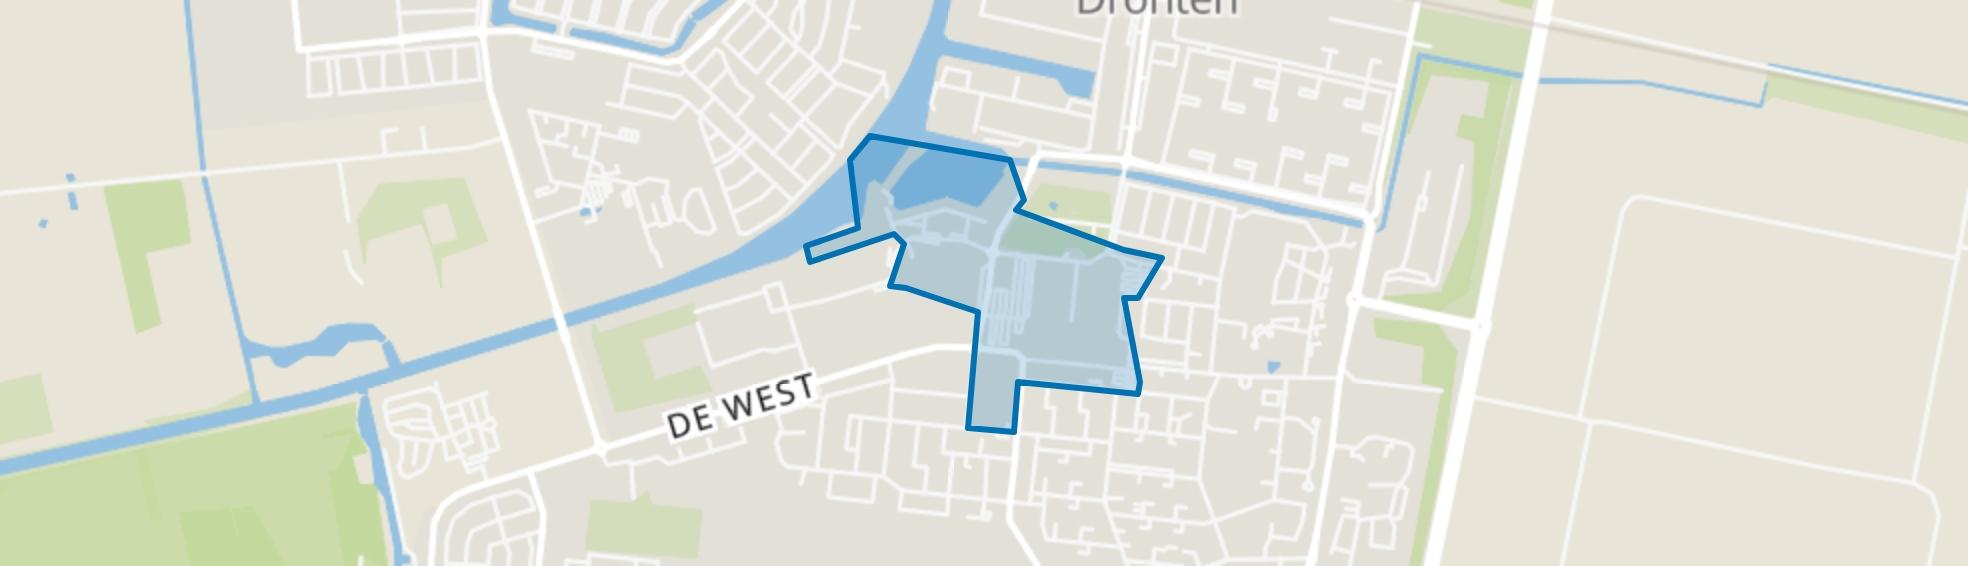 Centrum Dronten, Dronten map